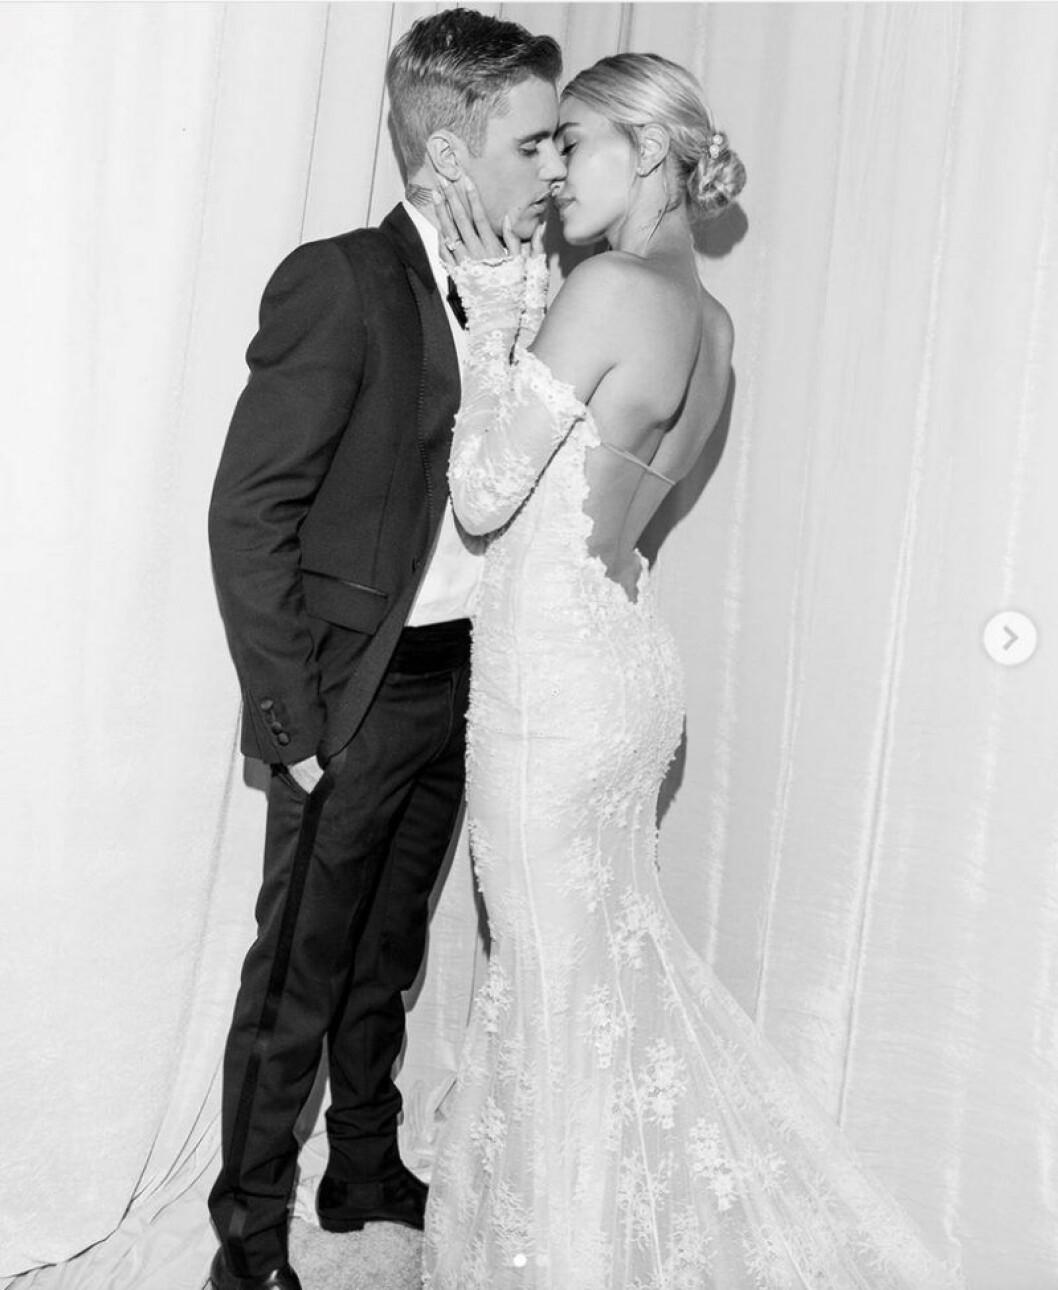 Hailey Bieber och Justin Bieber bröllopsfoto